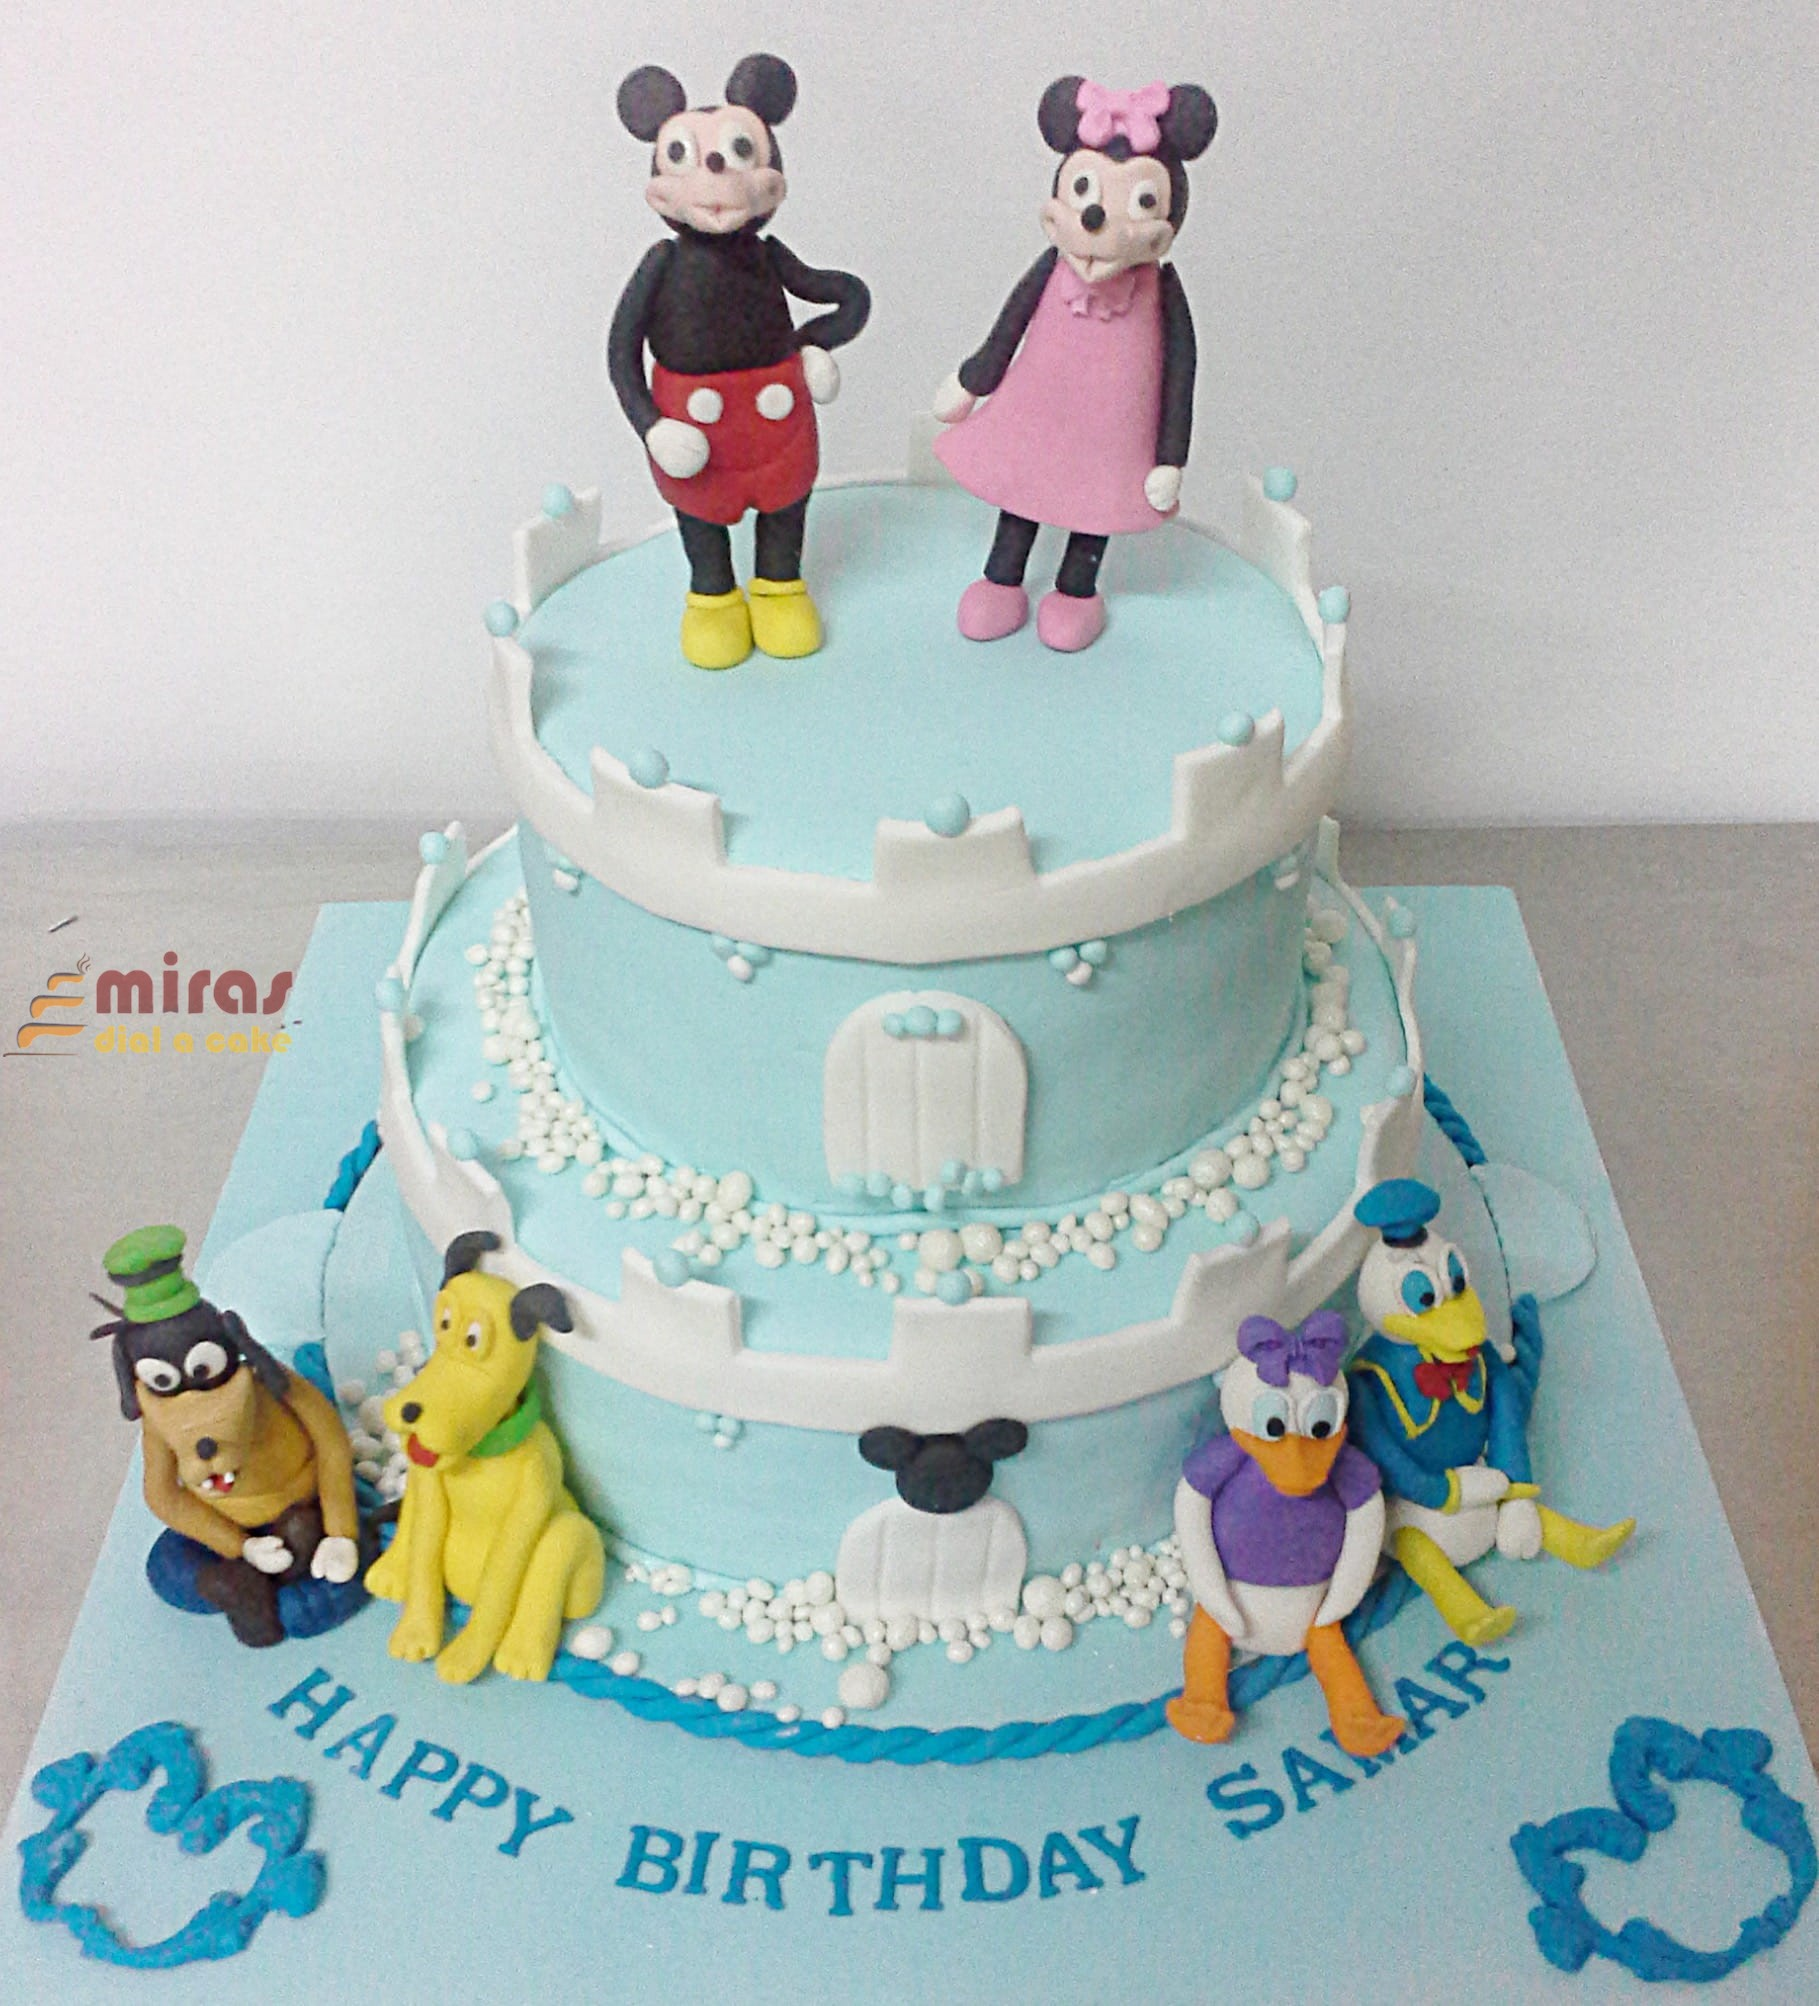 Tremendous Customized Theme Cakes For Birthday Wedding Anniversary Baby Funny Birthday Cards Online Alyptdamsfinfo